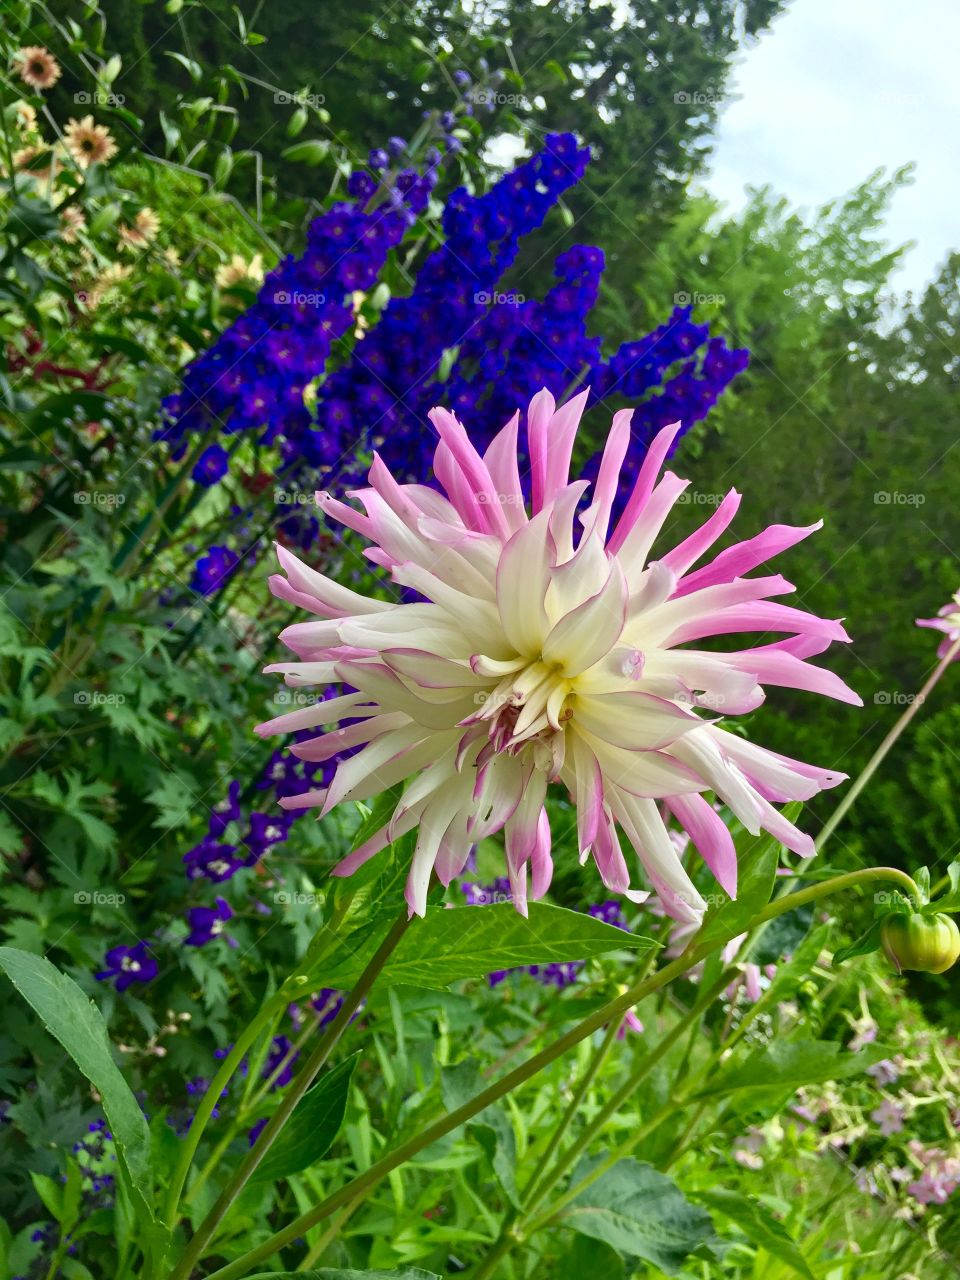 Thuya garden is the hidden gem in Acadia national park, Maine. Refreshing fragrances all around the garden...